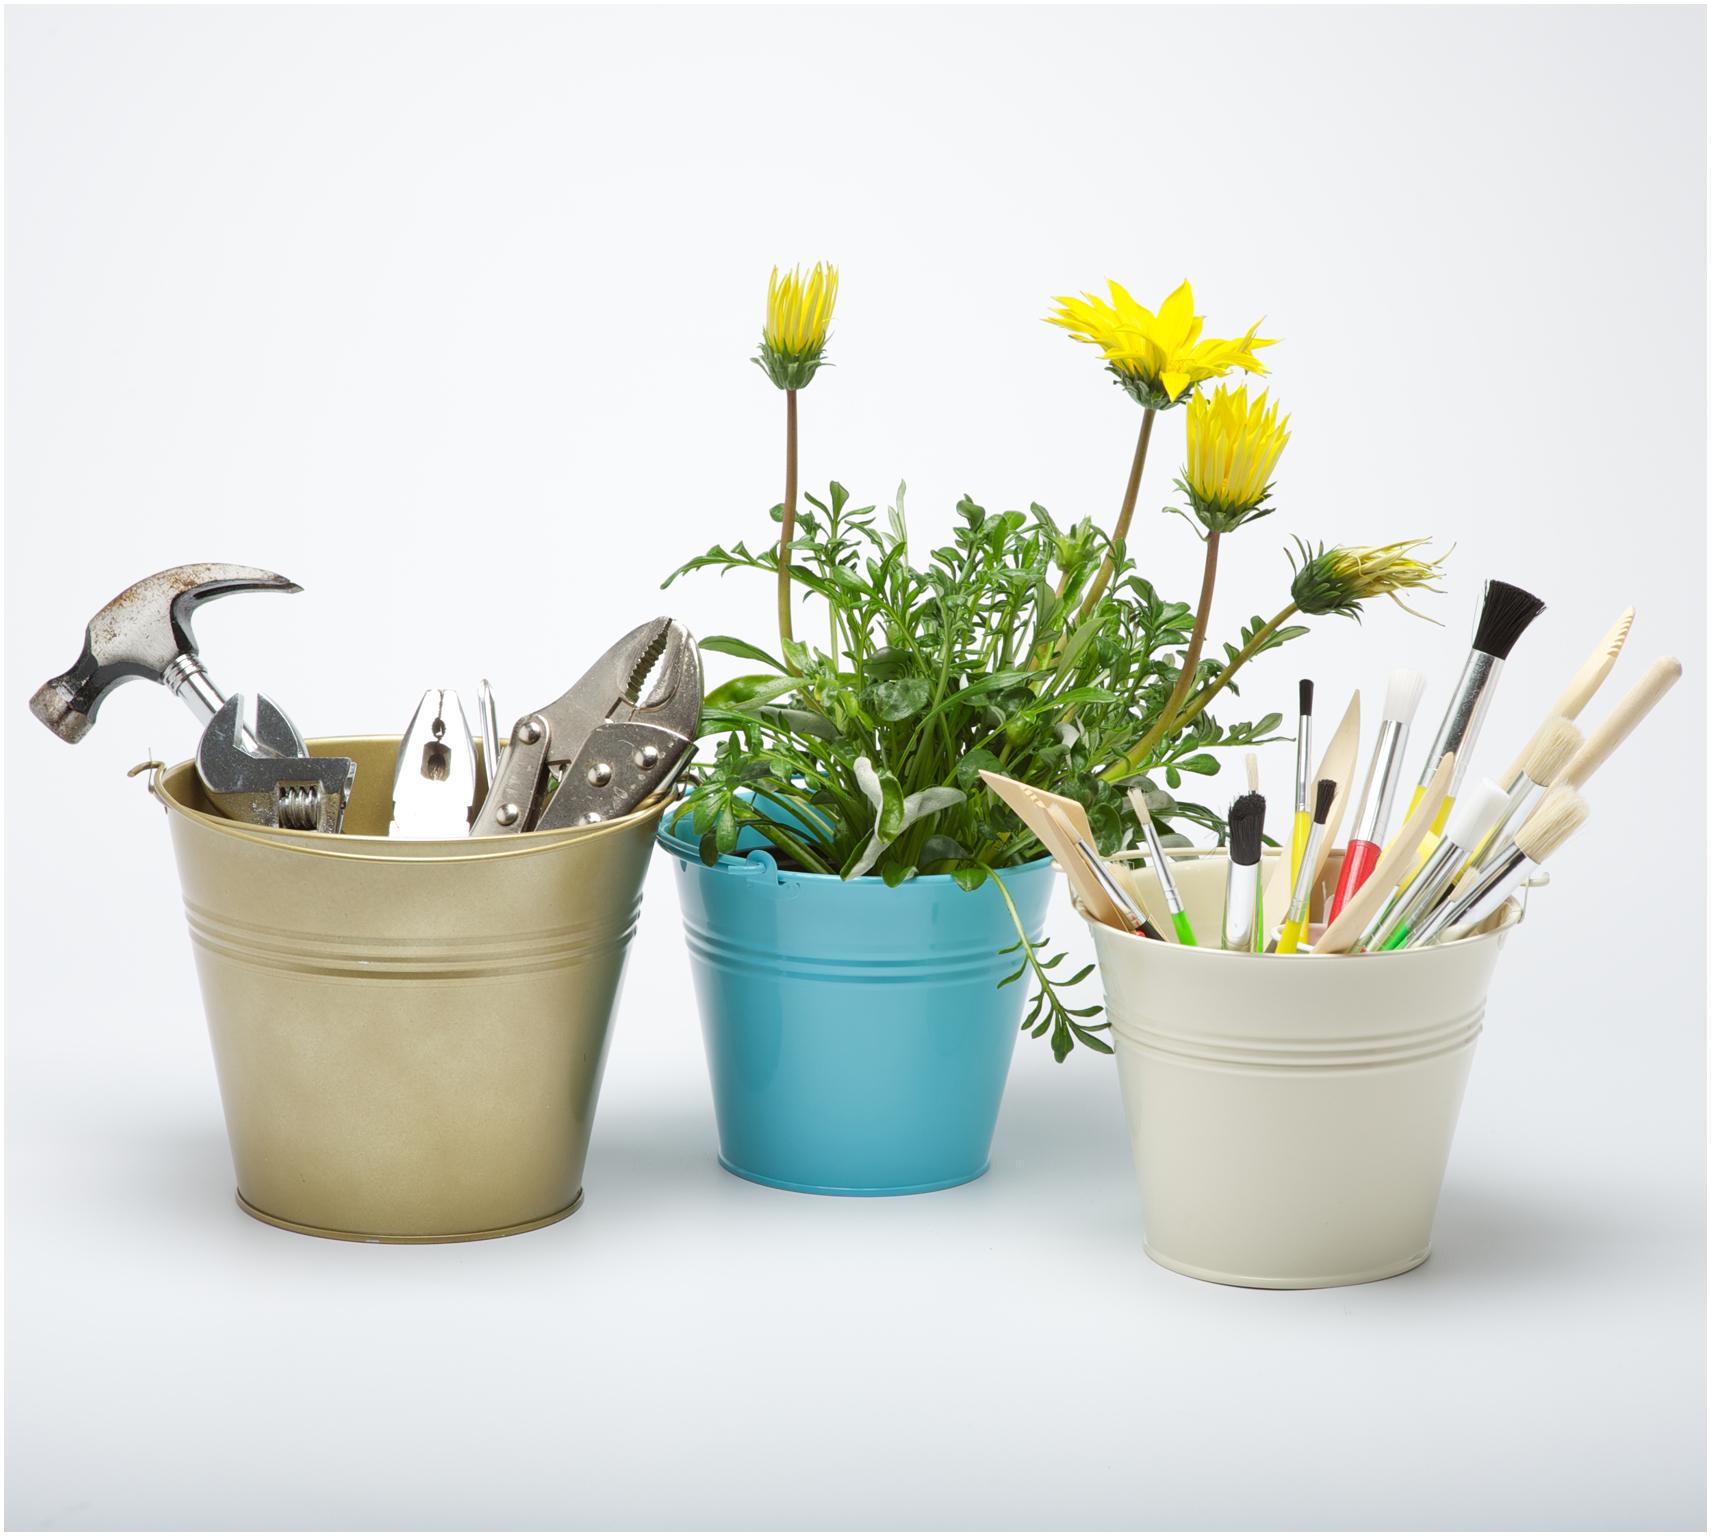 Mini flower pots wedding favors for Small pail buckets